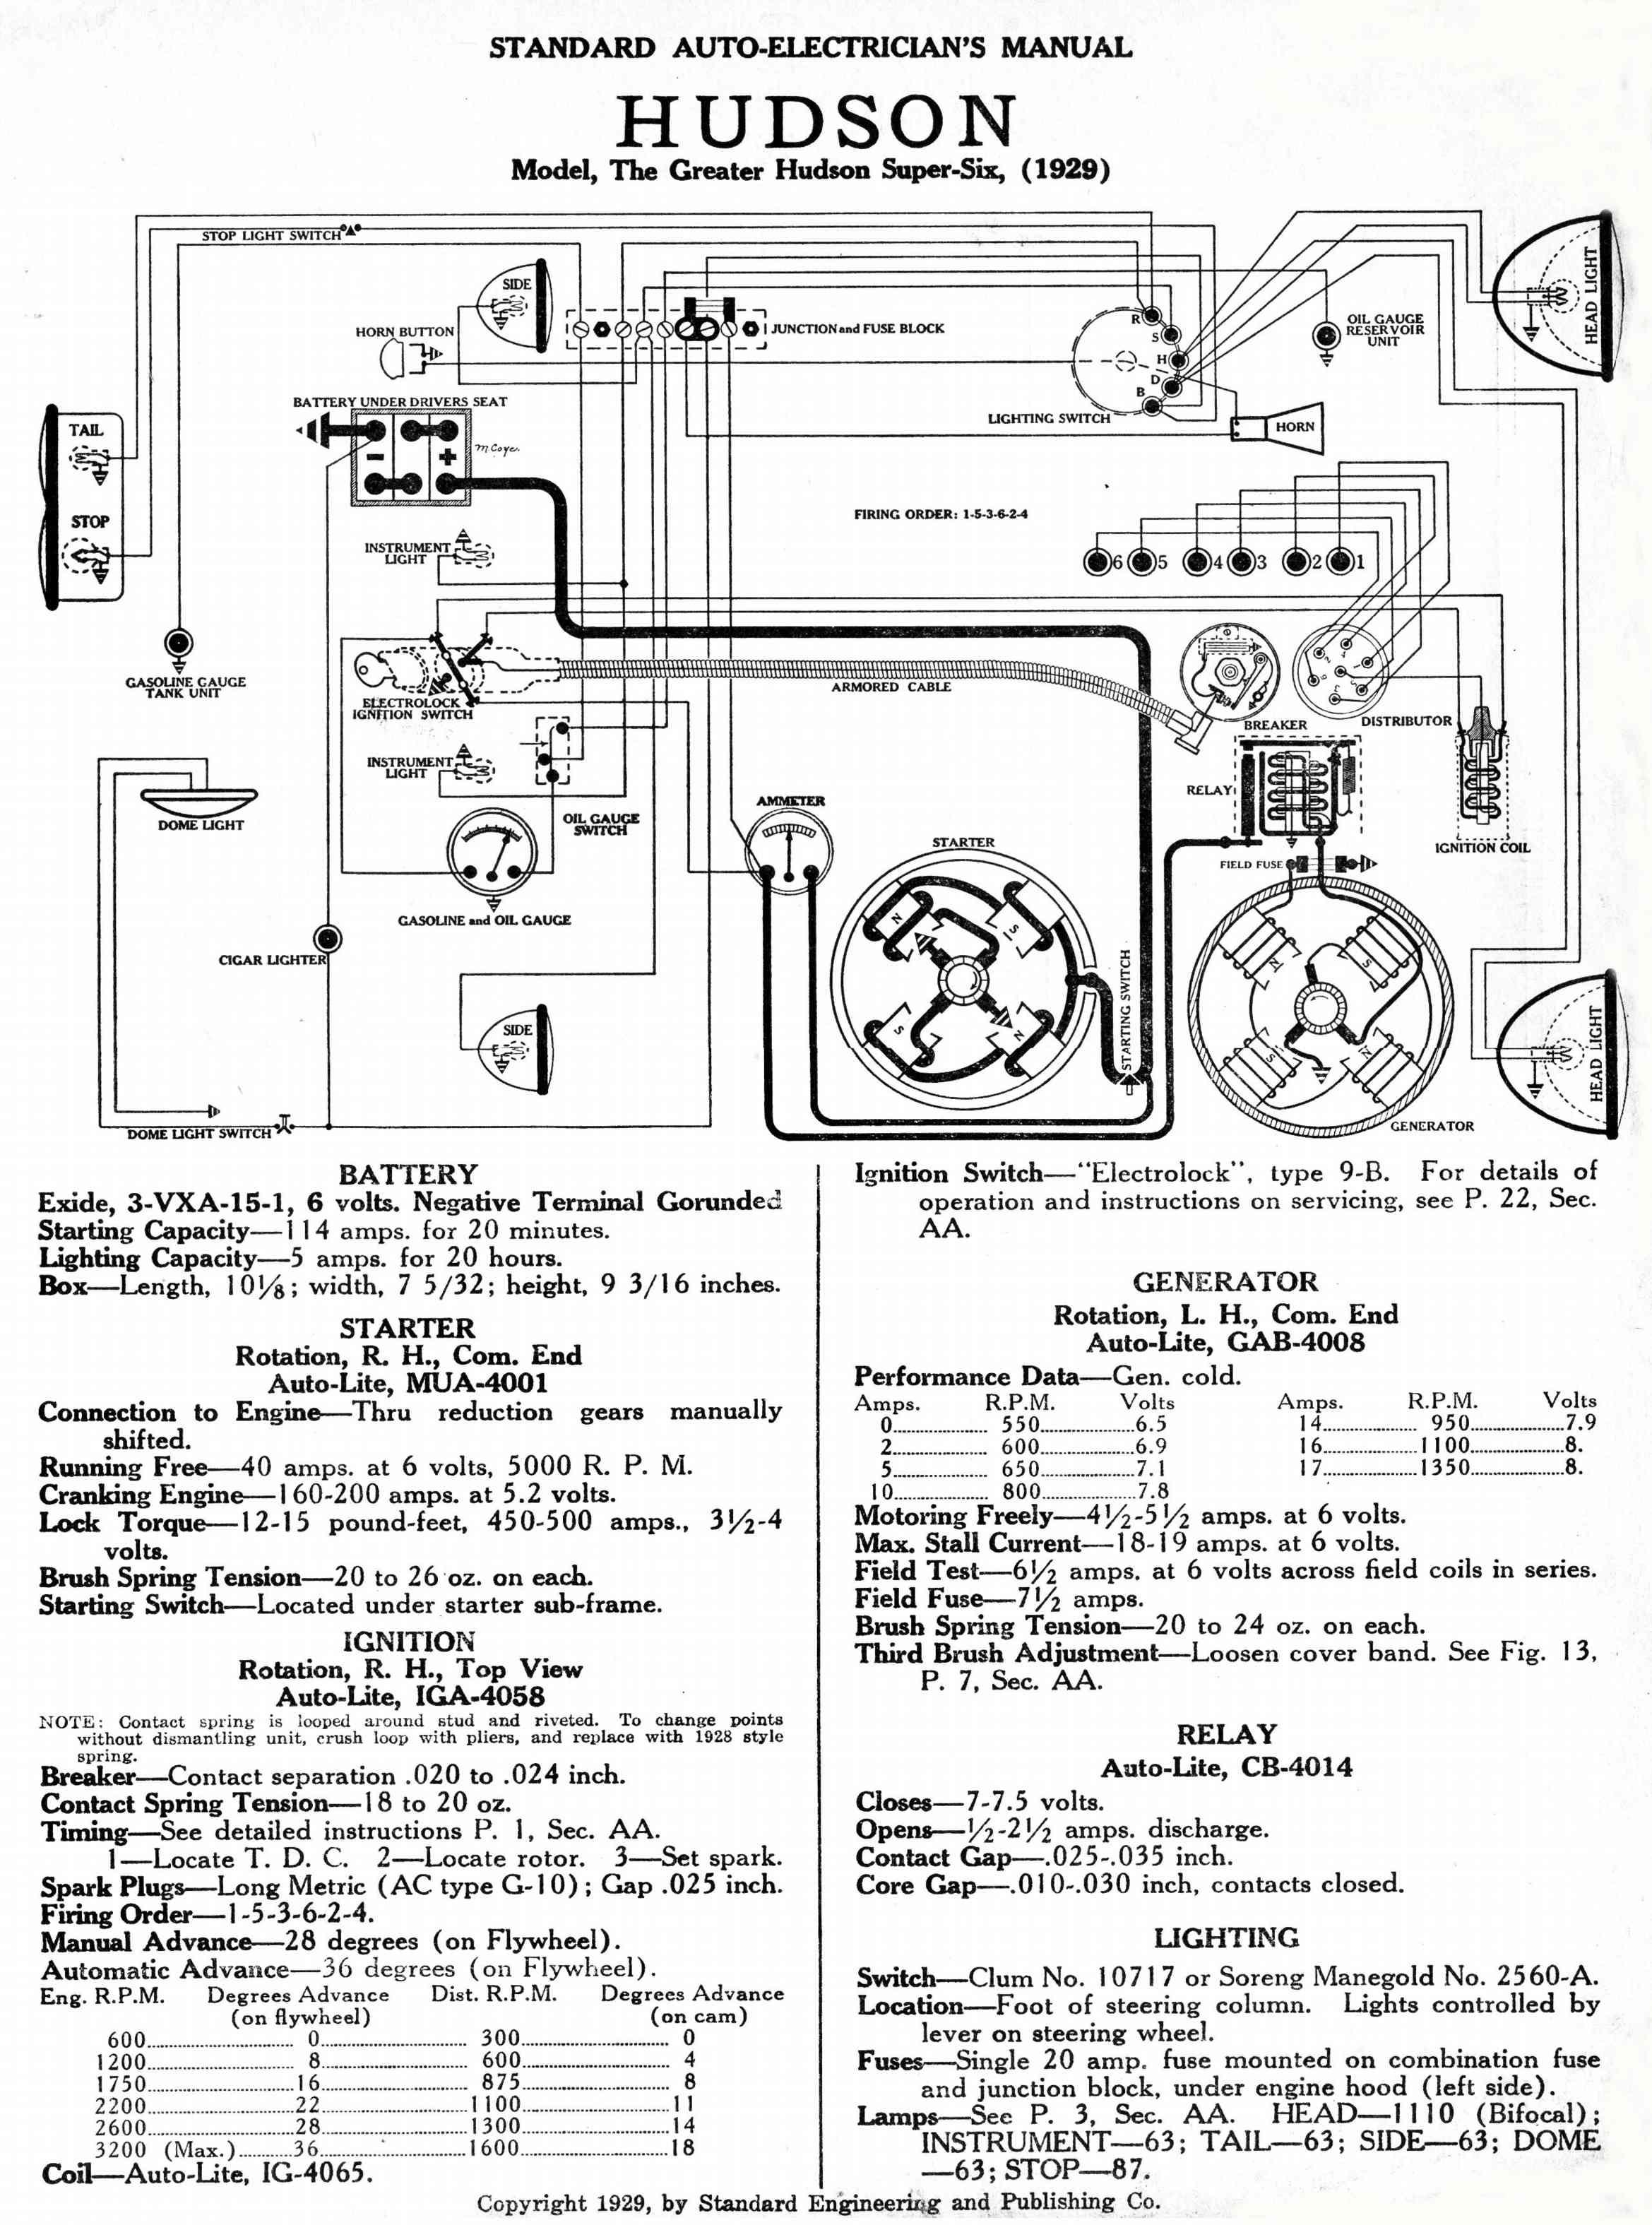 Phenomenal 1950 Hudson Wiring Diagram Online Wiring Diagram Wiring Database Ittabxeroyuccorg